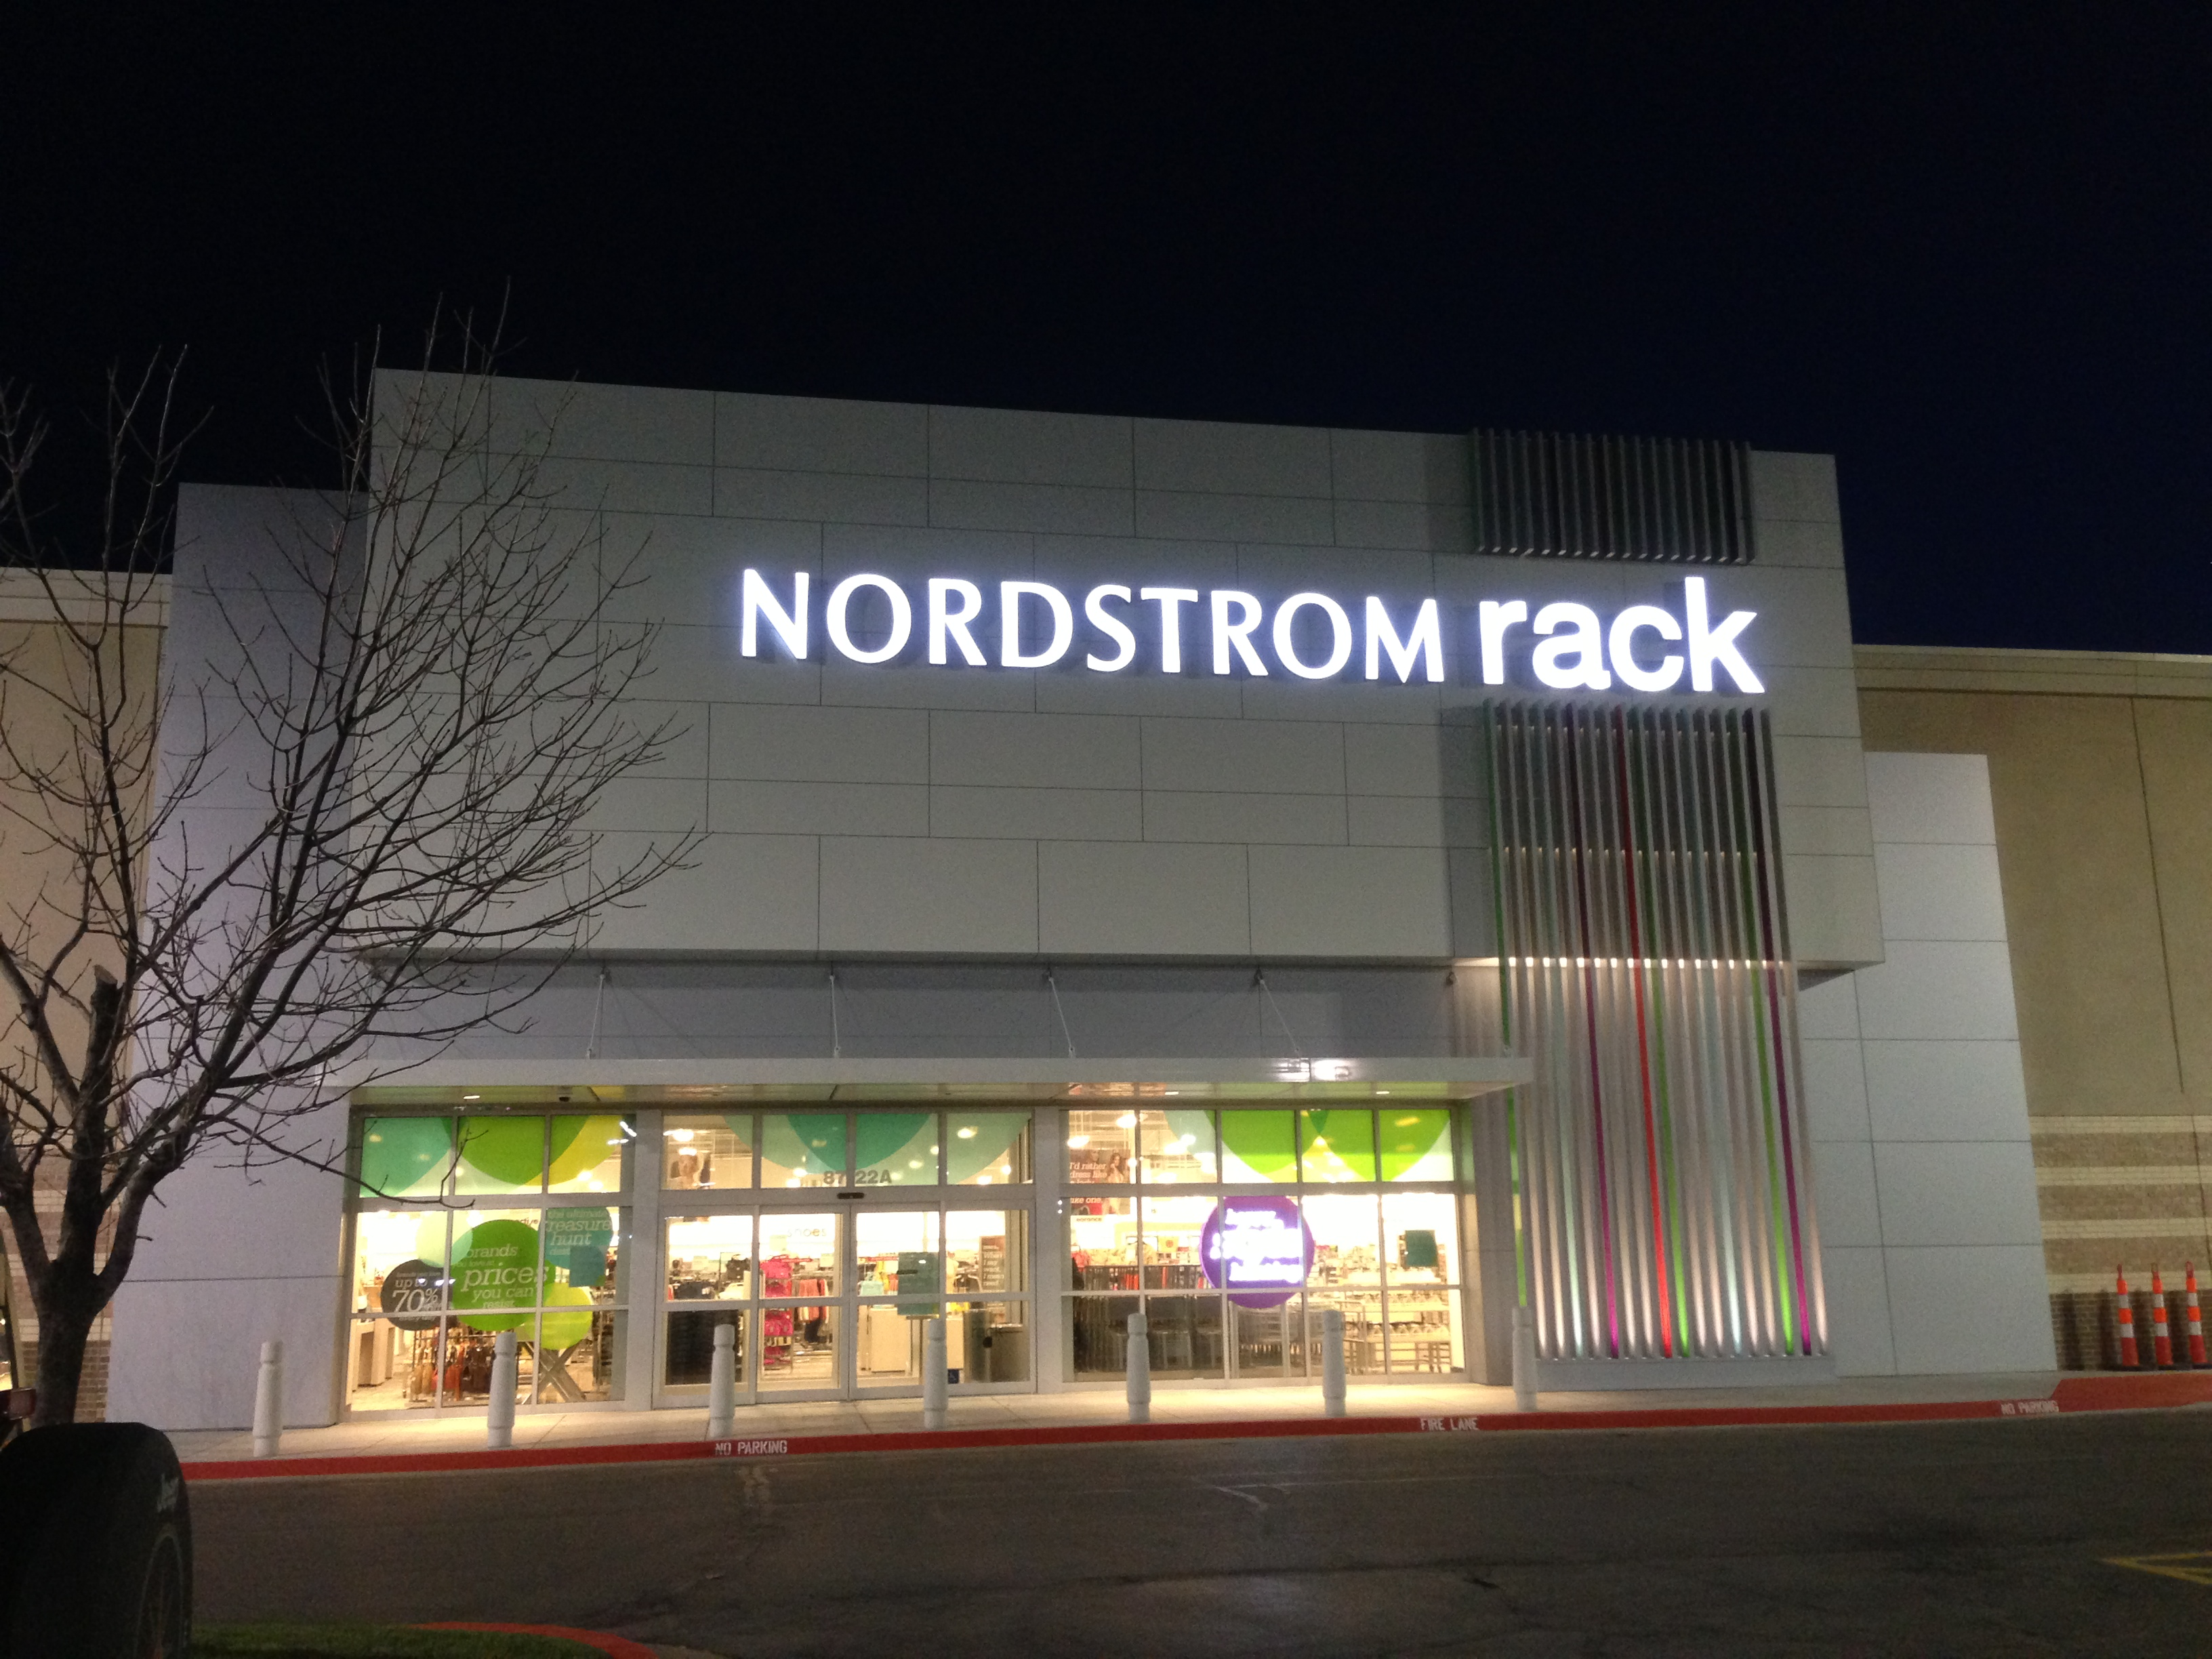 Woodland Plaza Nordstrom Rack (Tulsa)